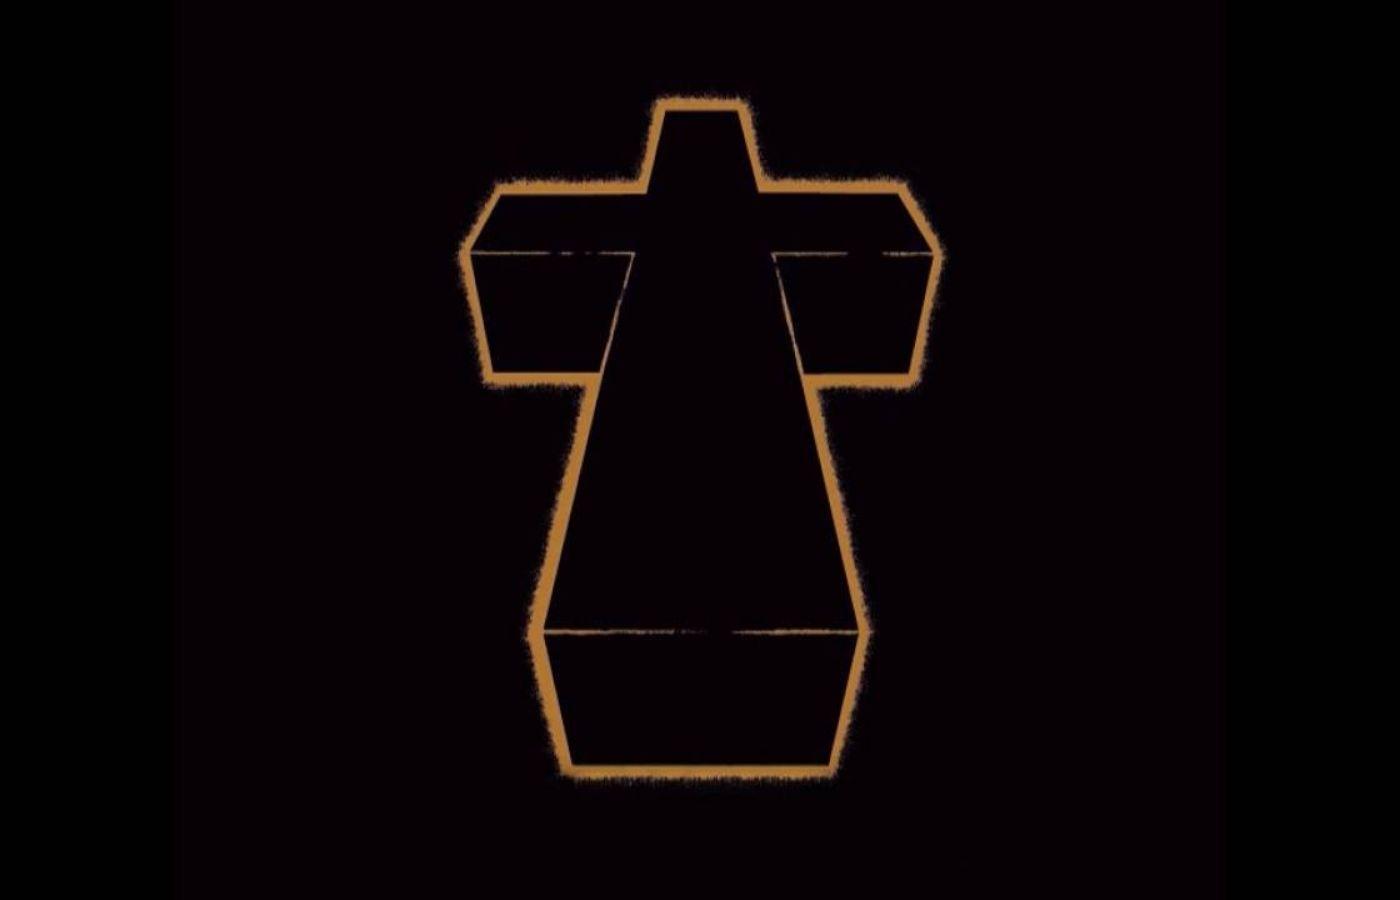 """†"": A catorce años del álbum que llevó a Justice a la cima"